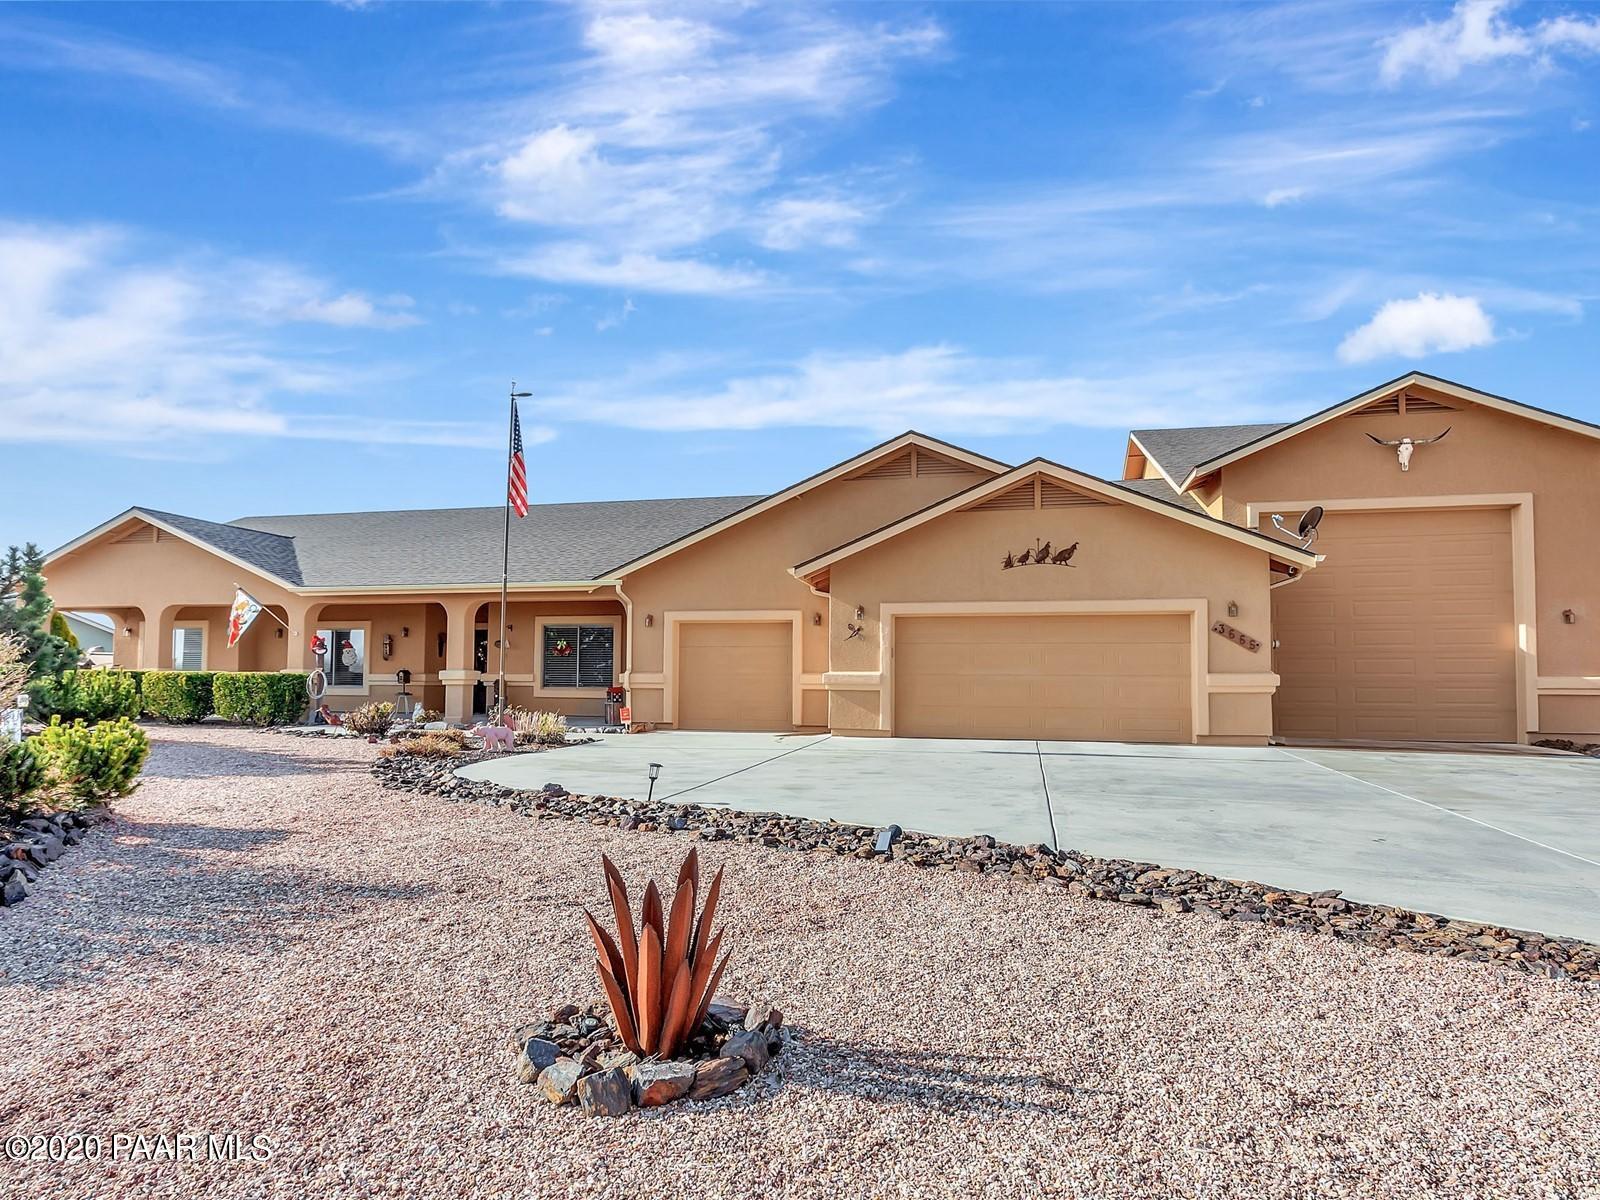 Photo of 3665 Grey Fox, Chino Valley, AZ 86323